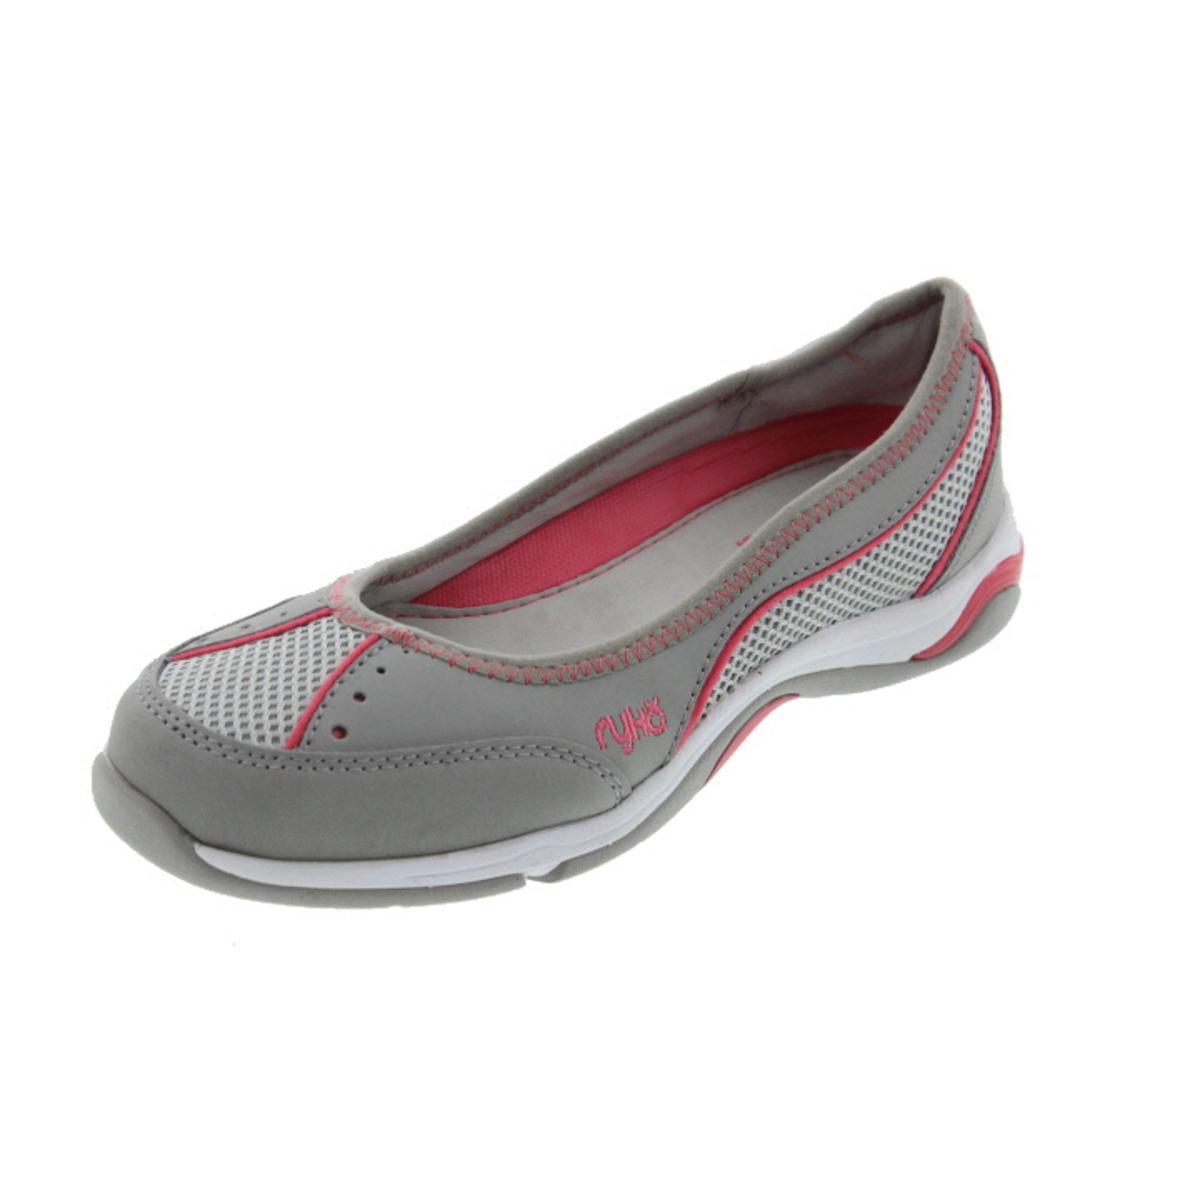 Ryka - Ryka Womens Tensile Leather Slip